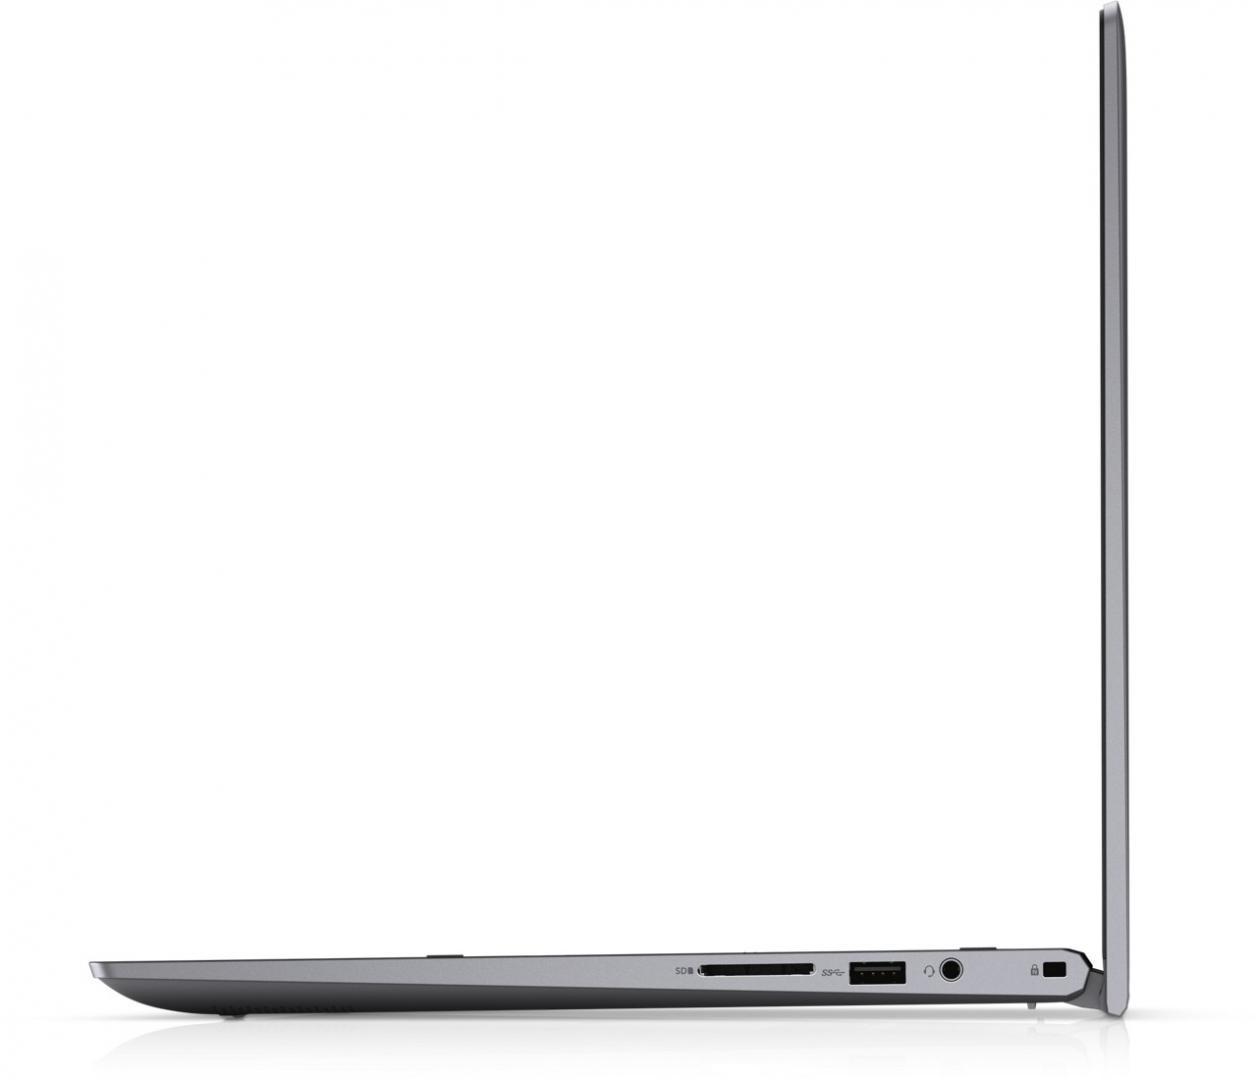 "Laptop Dell Inspiron 5406 2in1, 14.0"" FHD, Touch, i5-1135G7, 8GB, 256GB SSD, Intel Iris Xe Graphics, W10 Pro - imaginea 7"